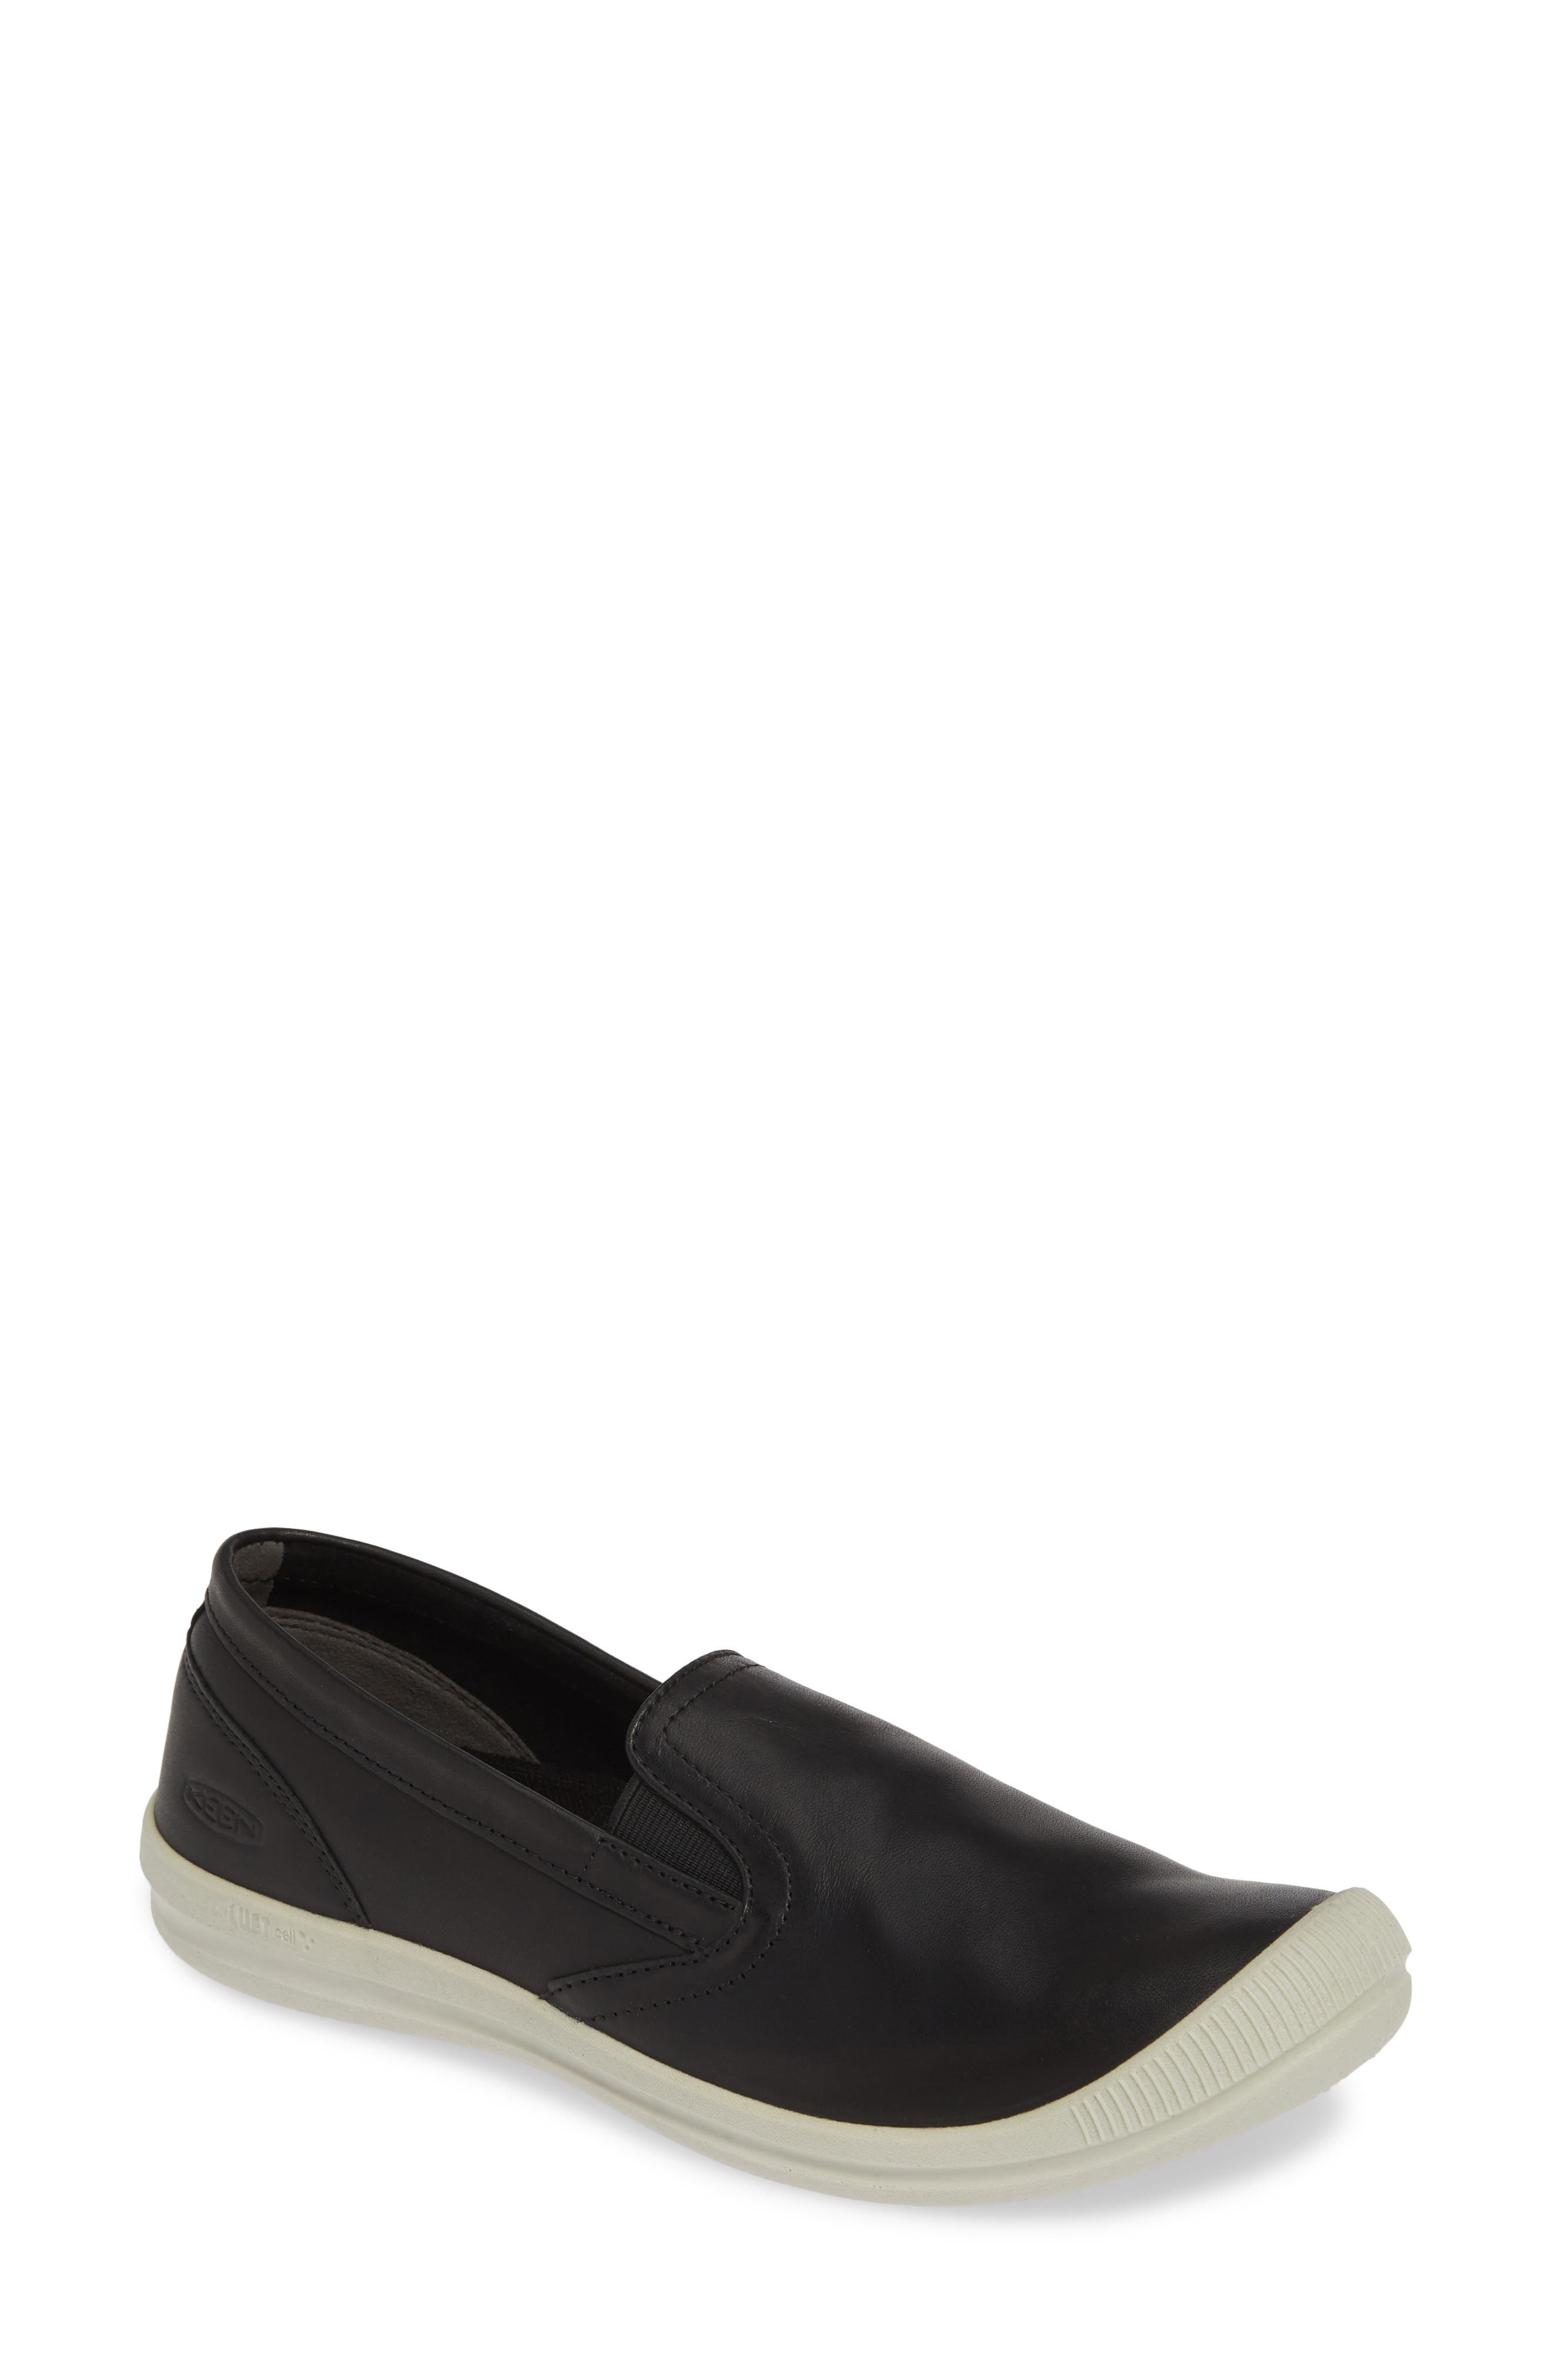 Image of Keen Lorelai Slip-On Sneaker